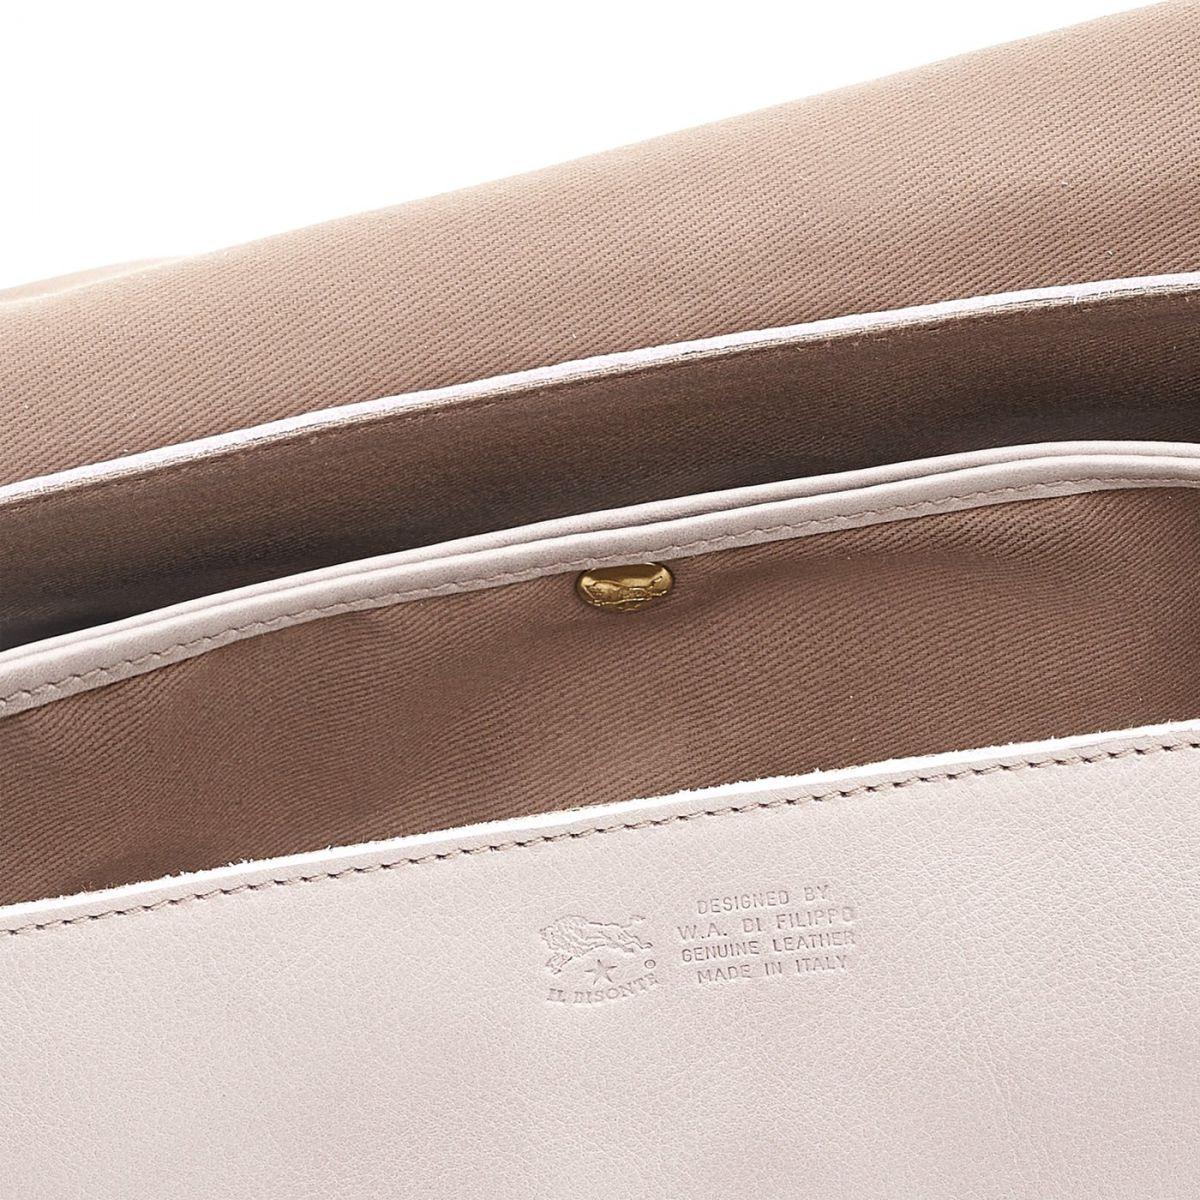 Women's Shoulder Bag in Cowhide Leather color Mauve - BSH034 | Details